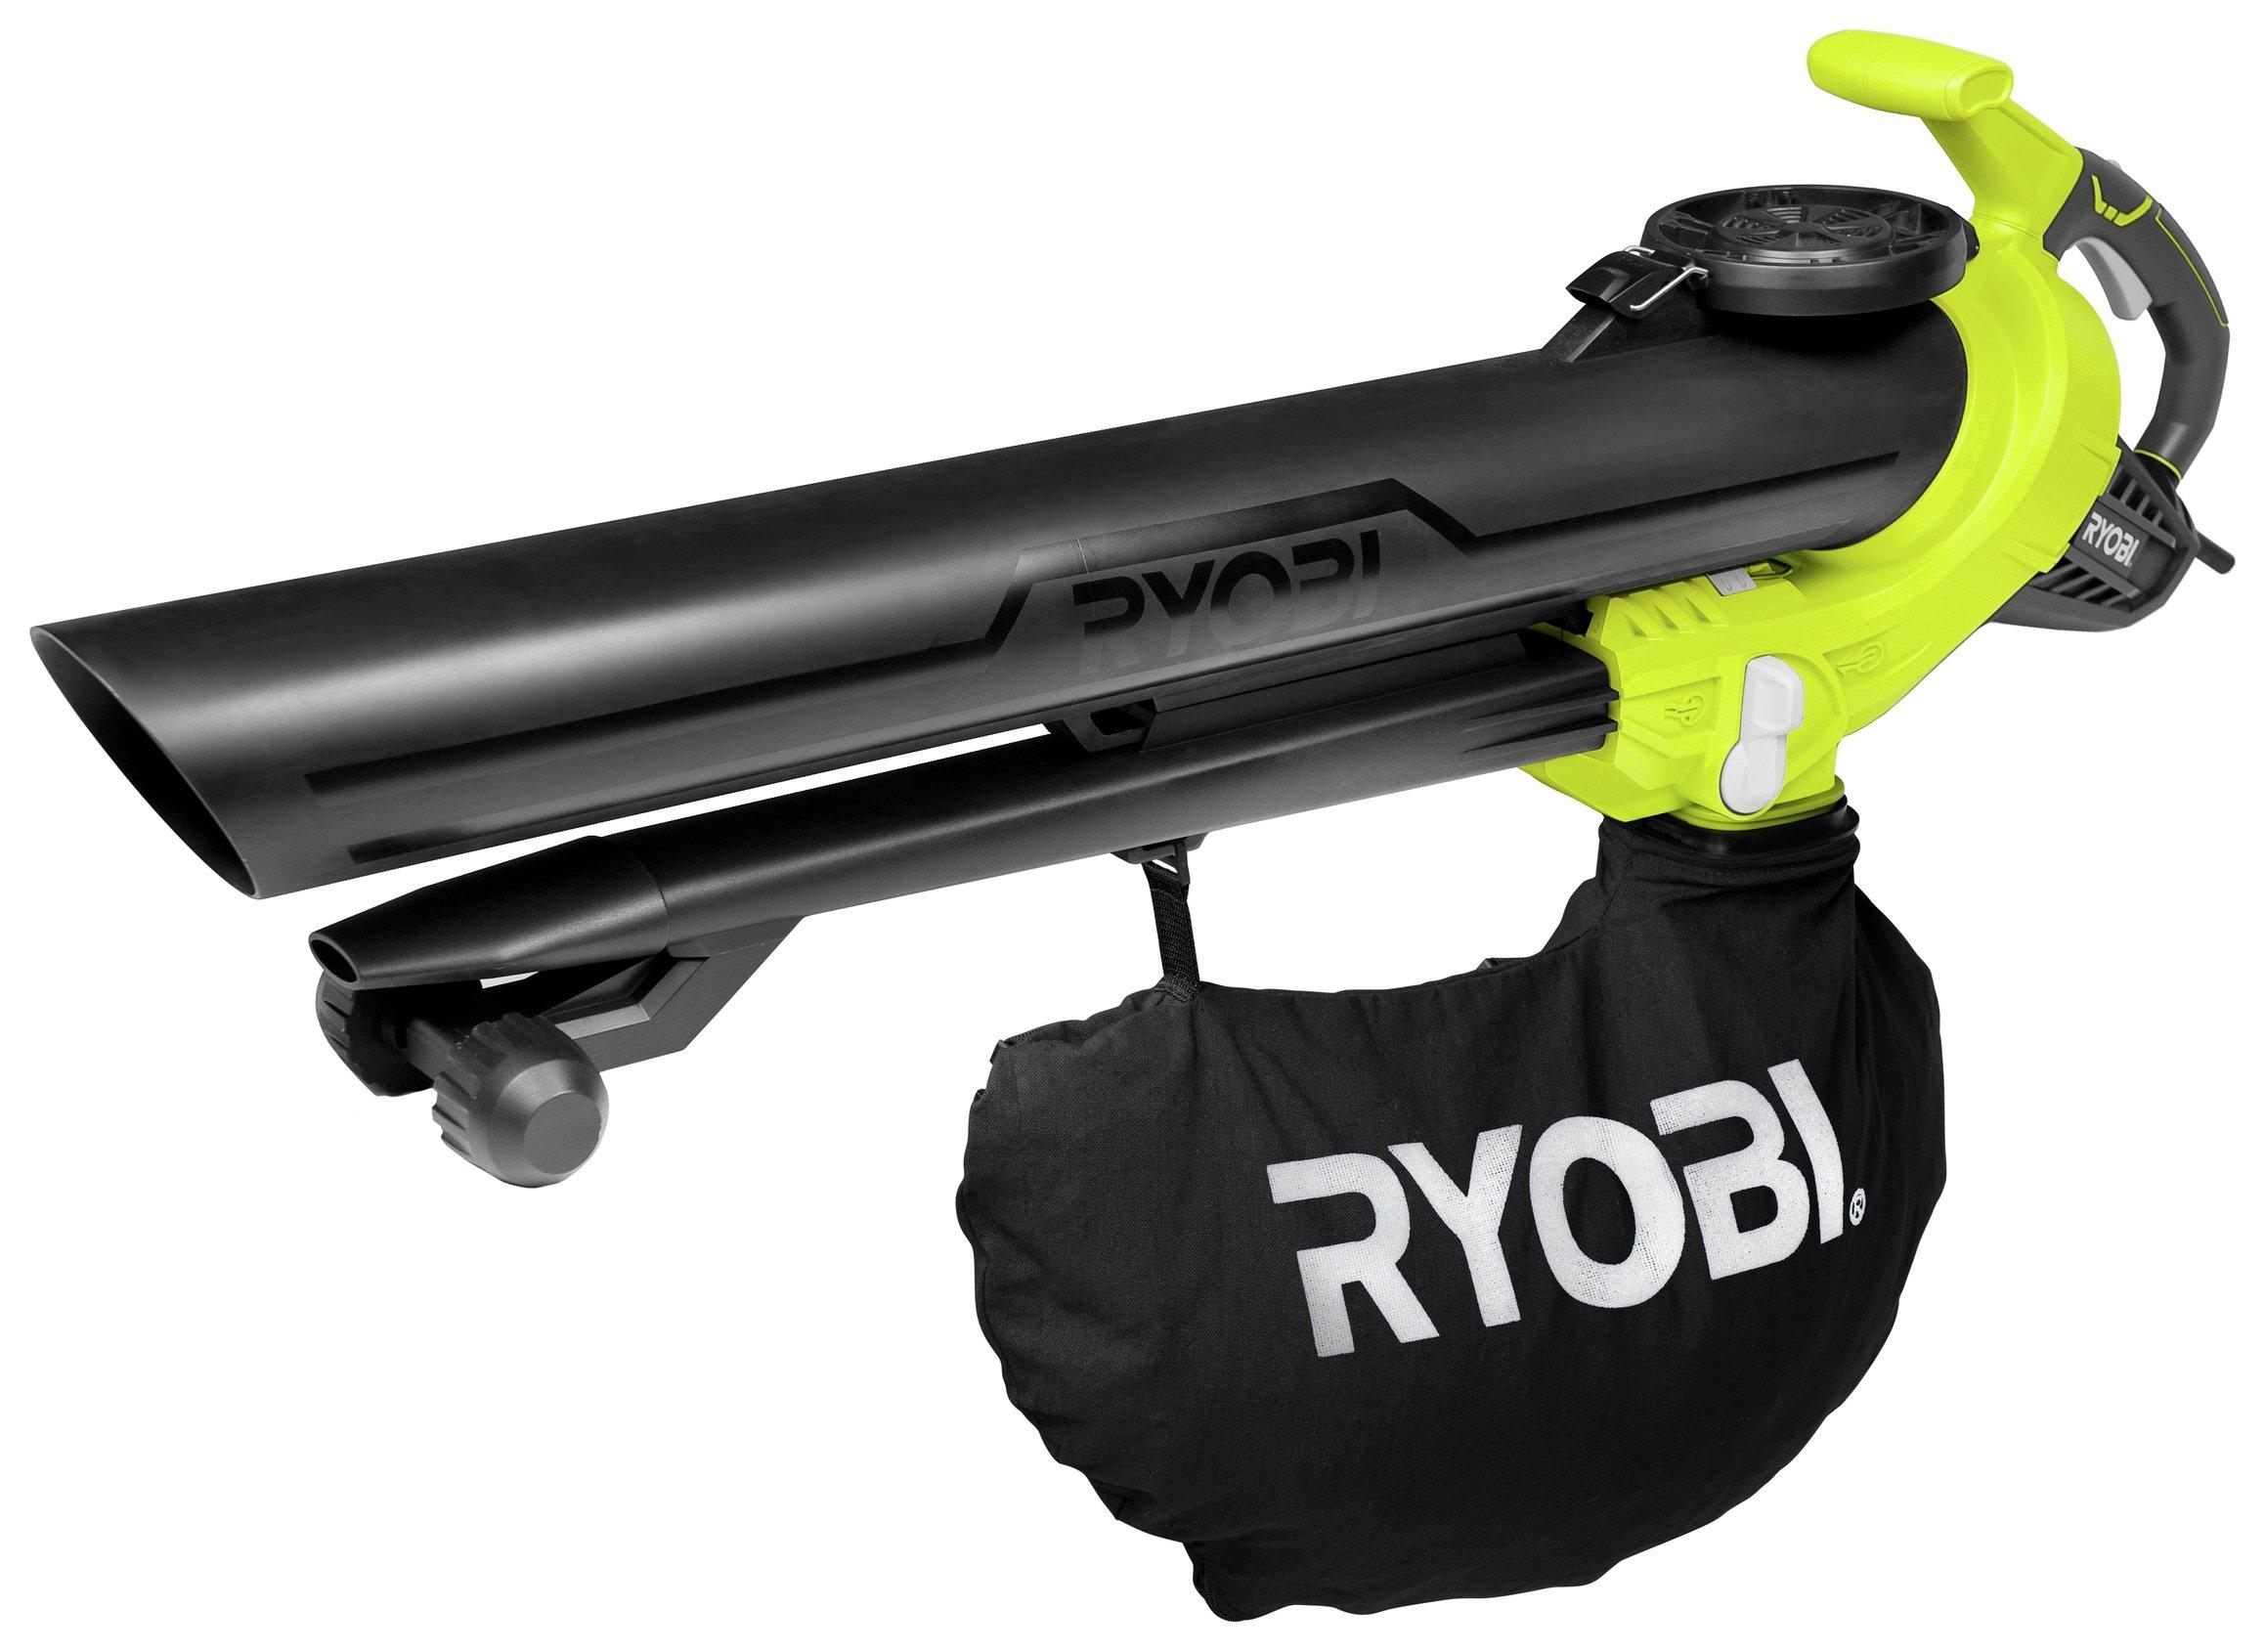 Ryobi - RBV3000CESV Corded Garden Vac - 3000W